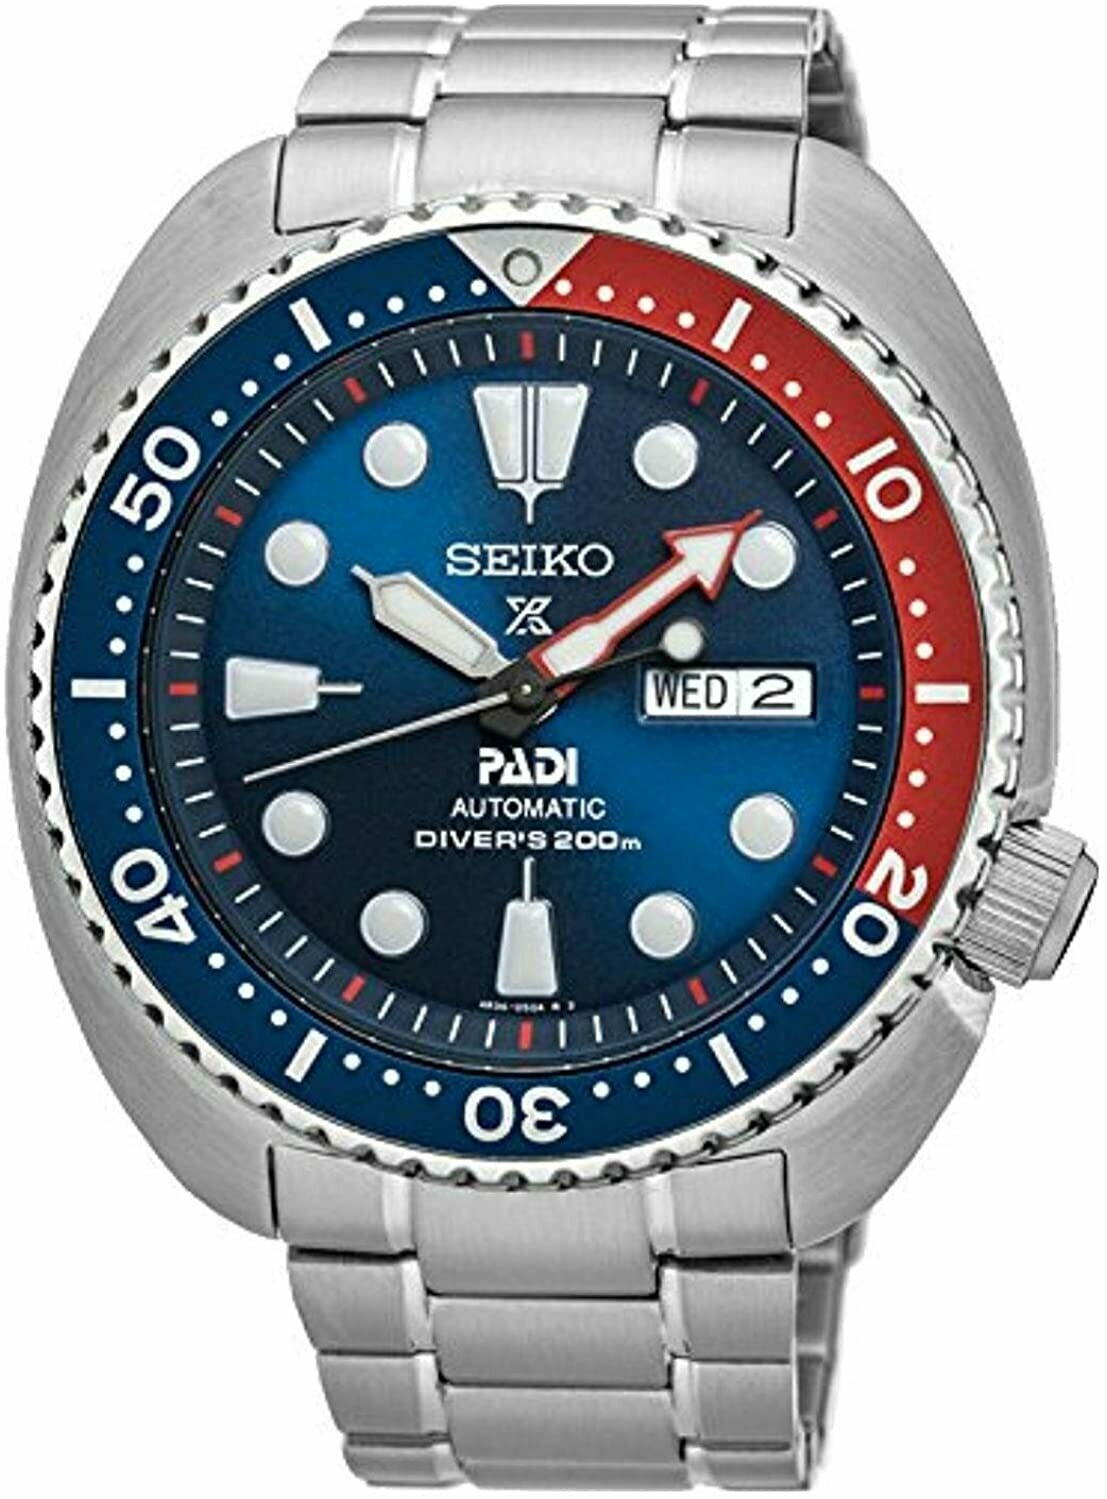 Reloj Automático hombre Seiko Prospex SRPA21K1 Turtle PADI dial azul 45mm correa acero 200m water resist